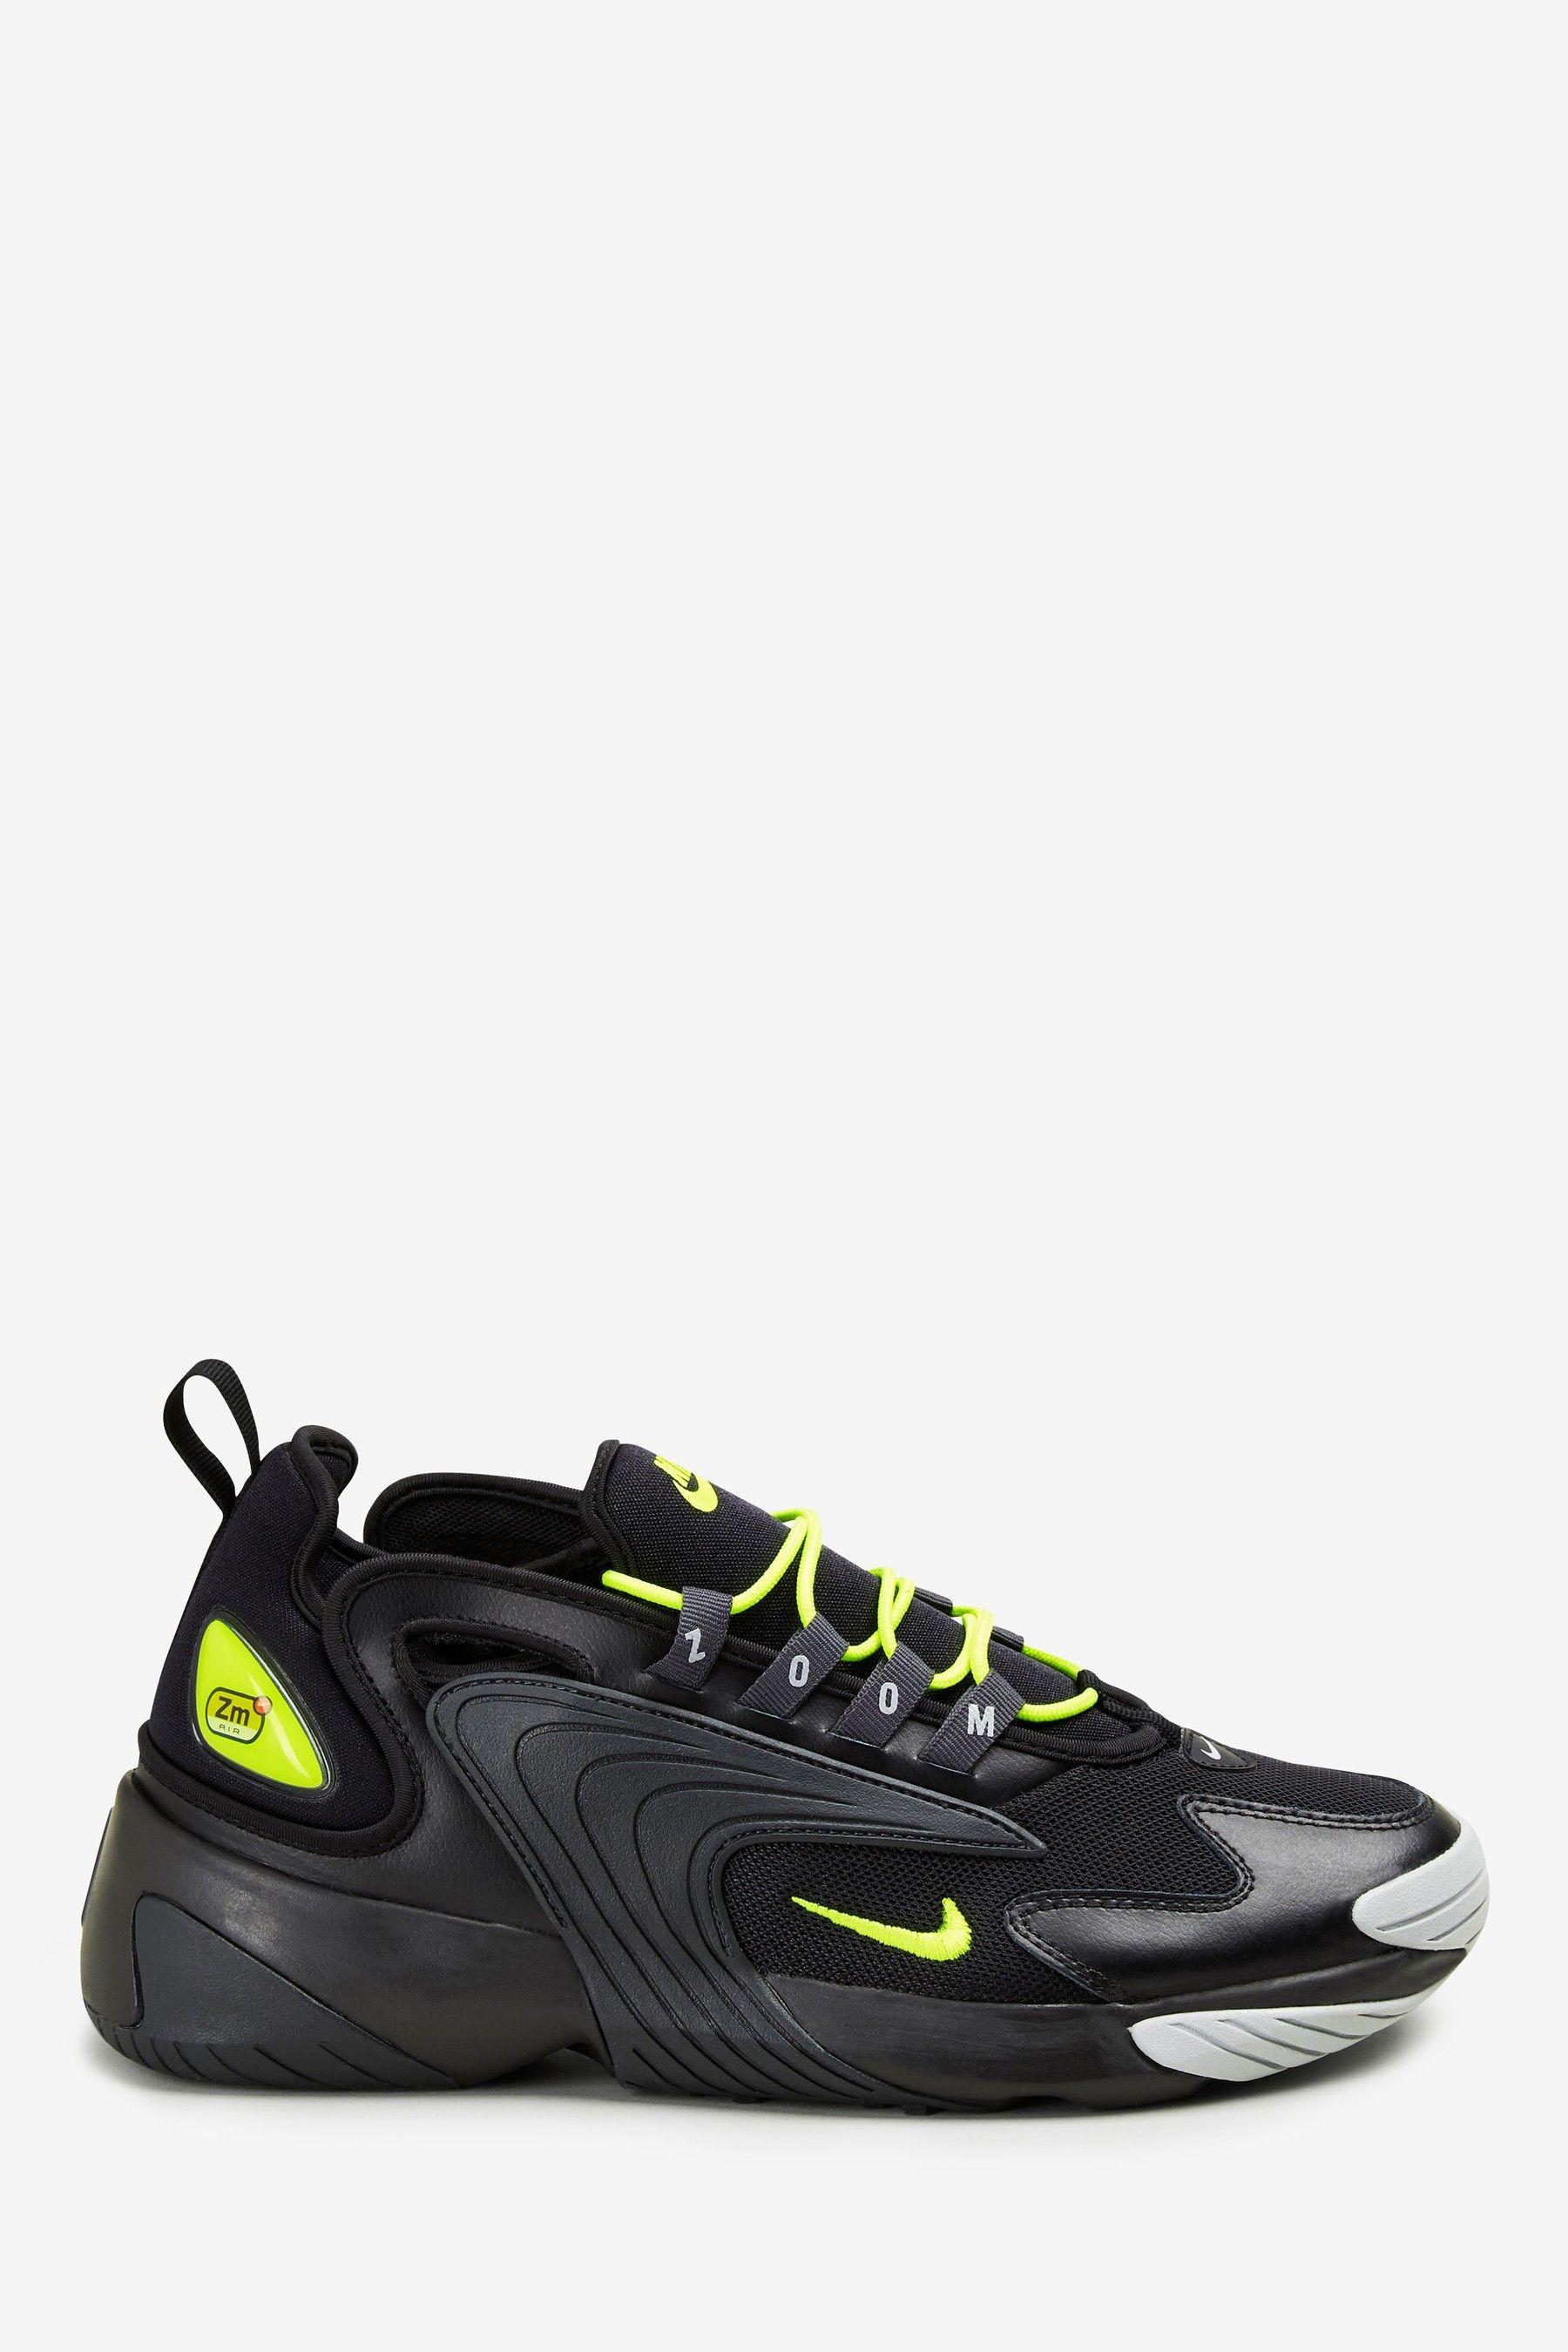 Mens Nike Black/Green Zoom 2K Trainers